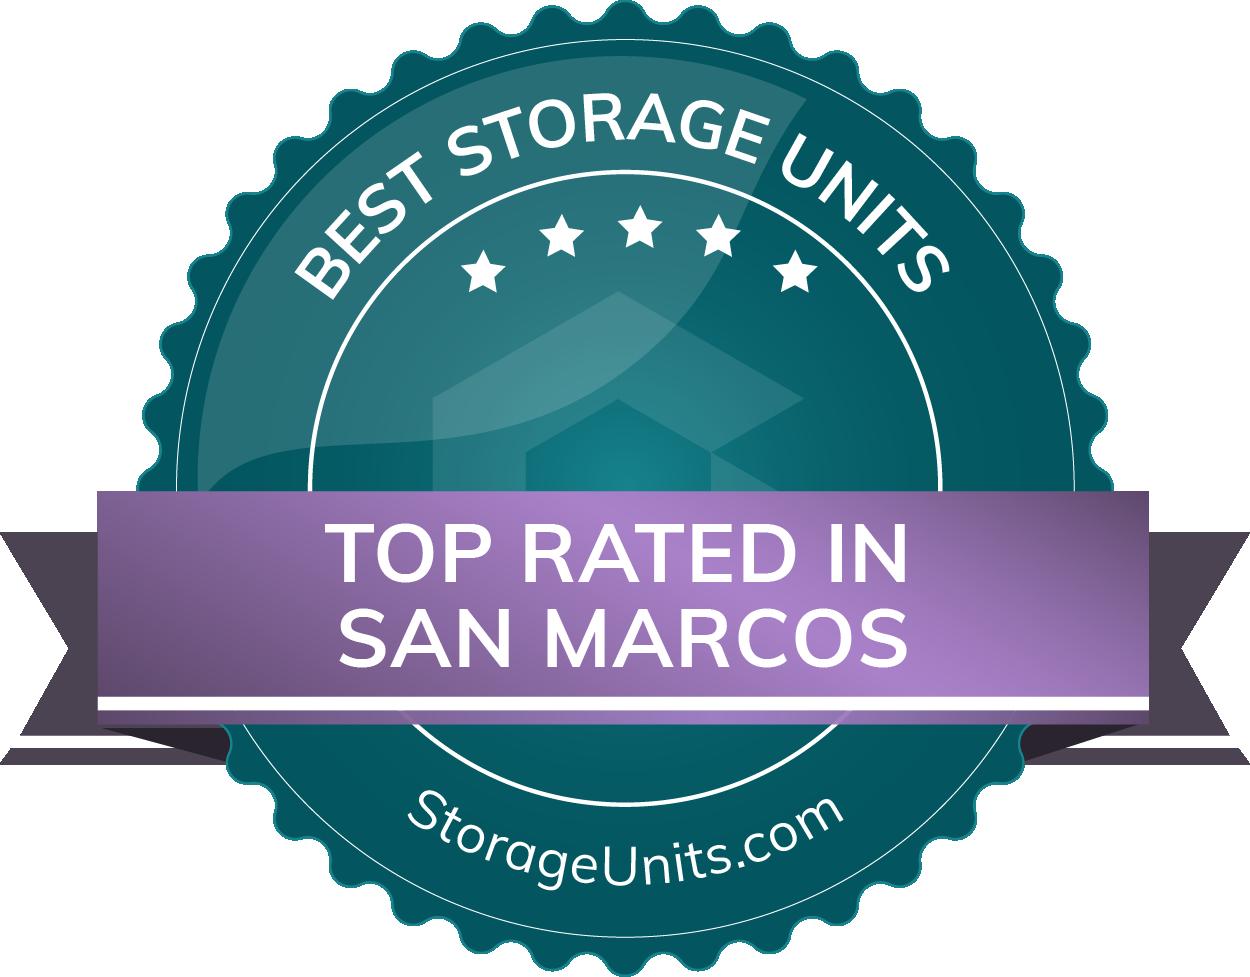 Best Self Storage Units in San Marcos, TX